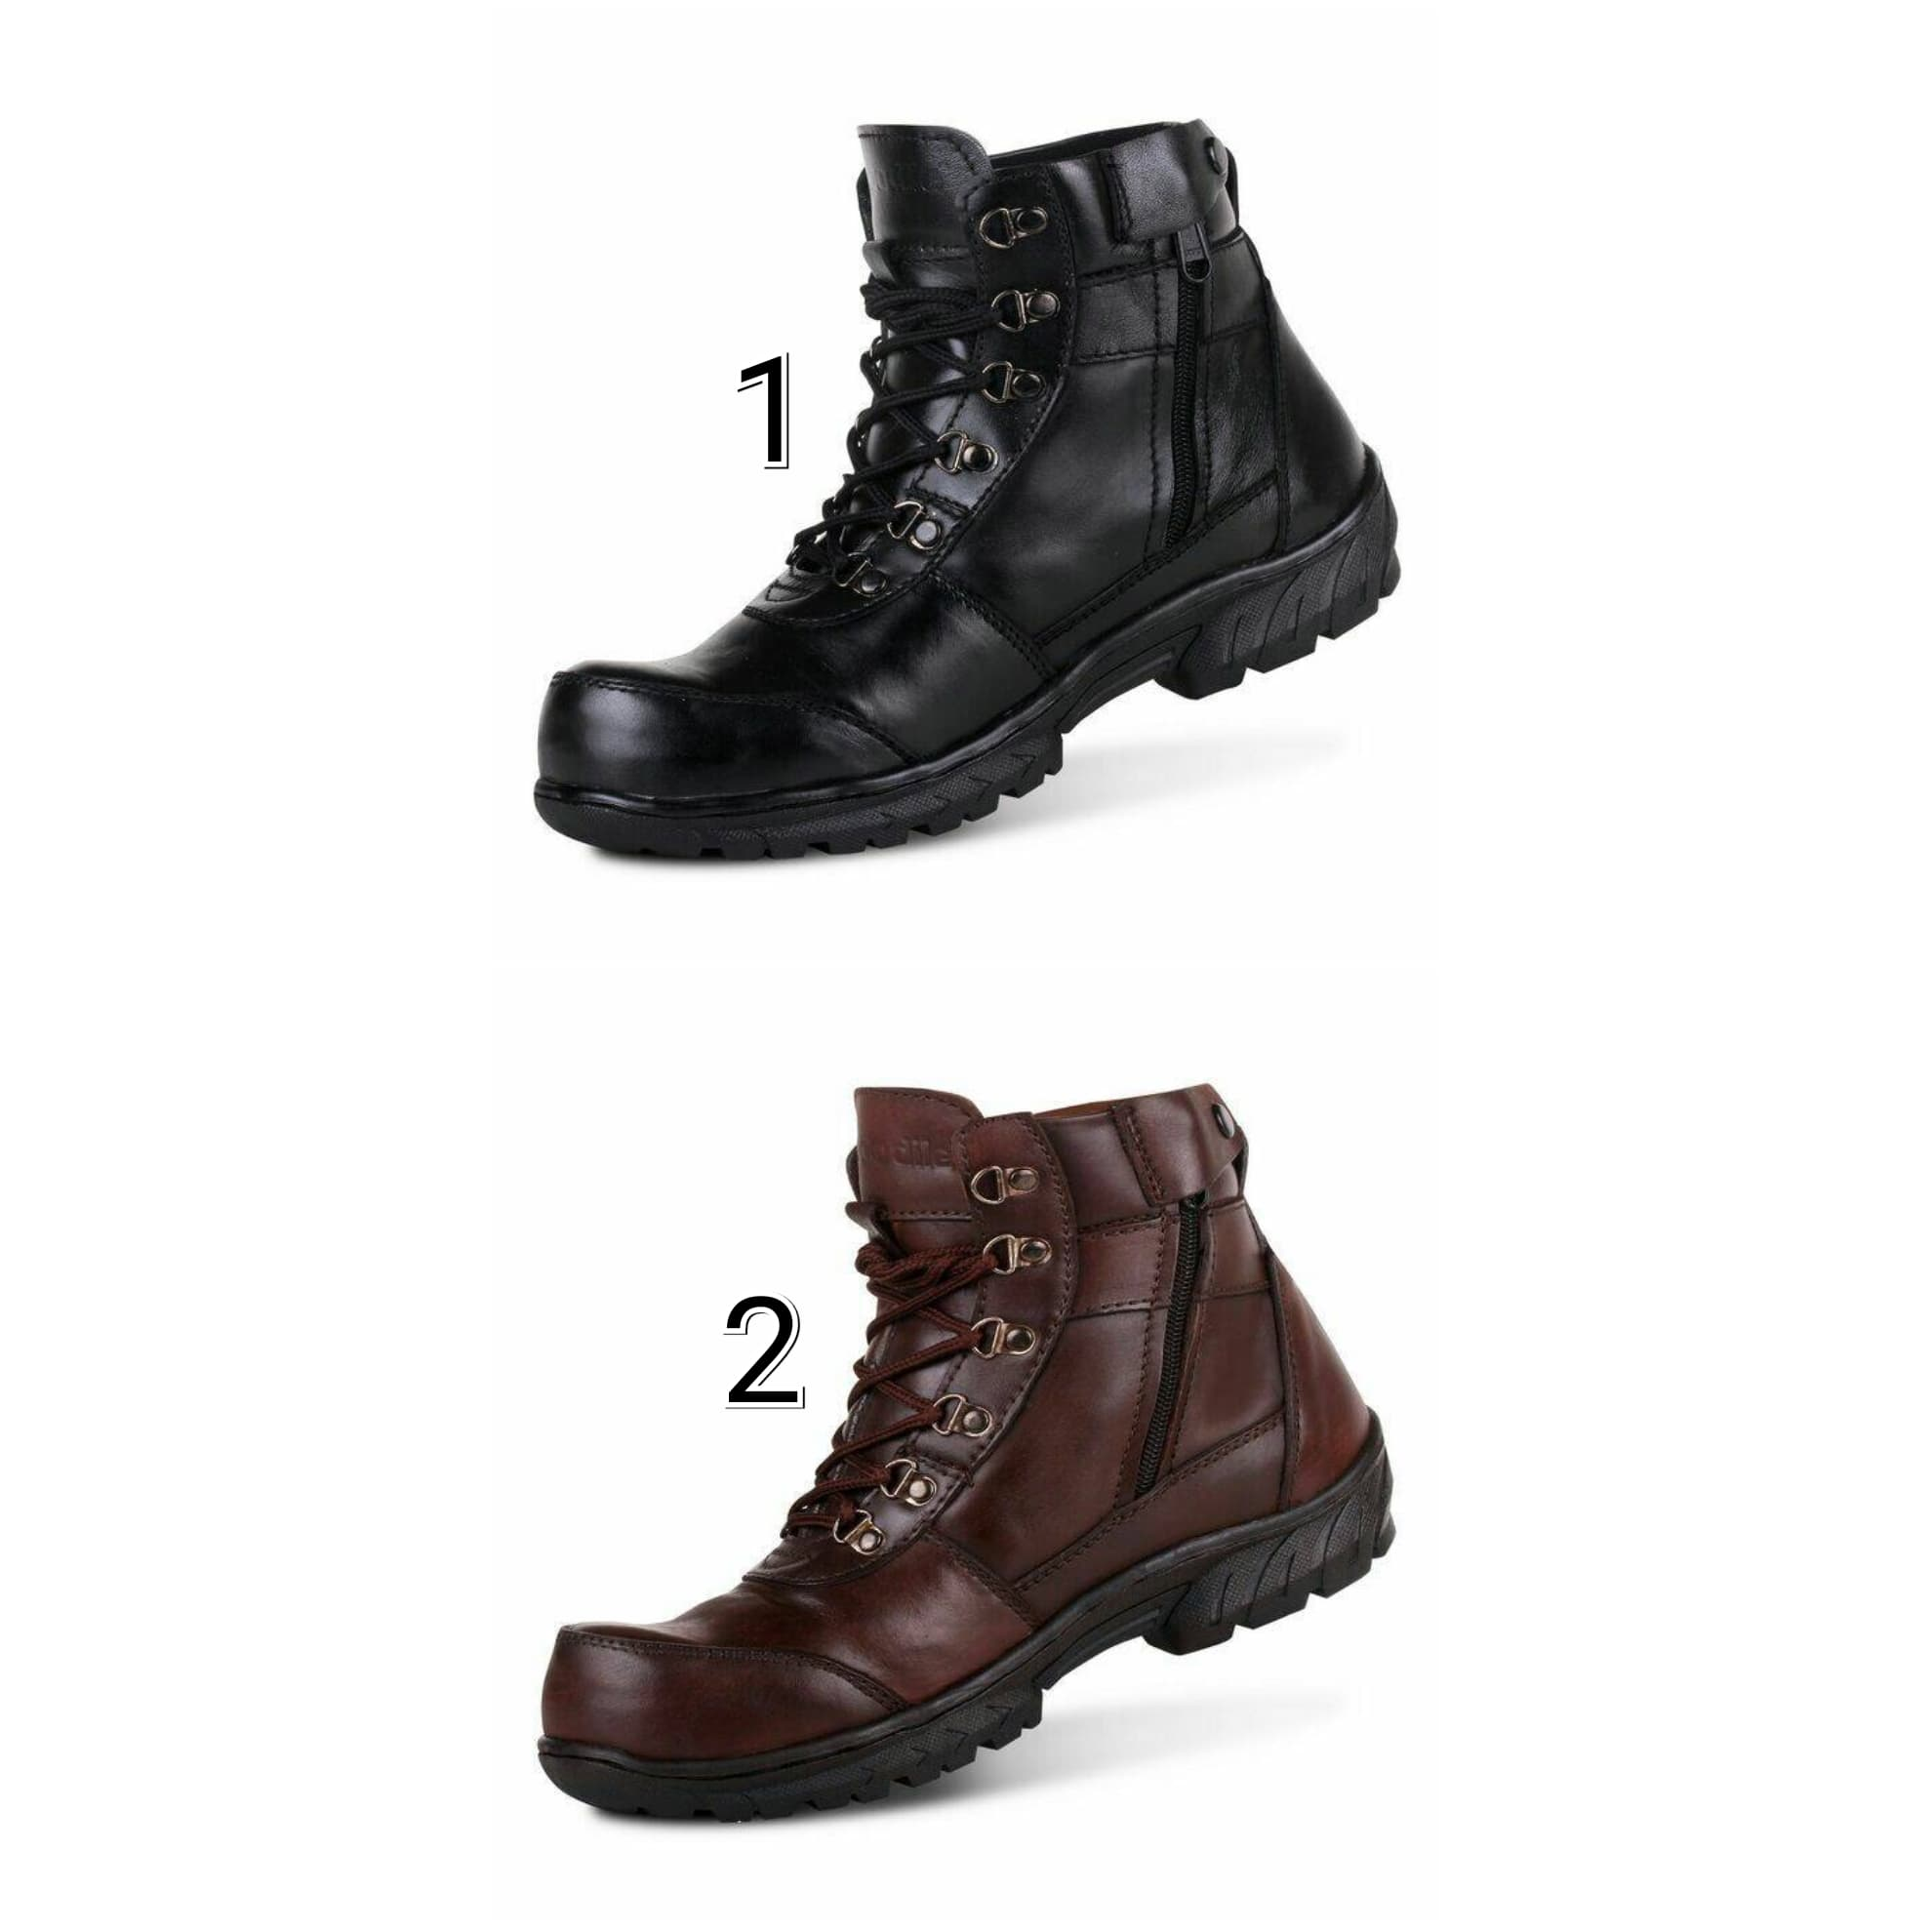 PENAWARAN Sepatu Boots Pria Crocodile Proyek Zip Kulit Asli Safety Ujung  Besi f15d5329d8